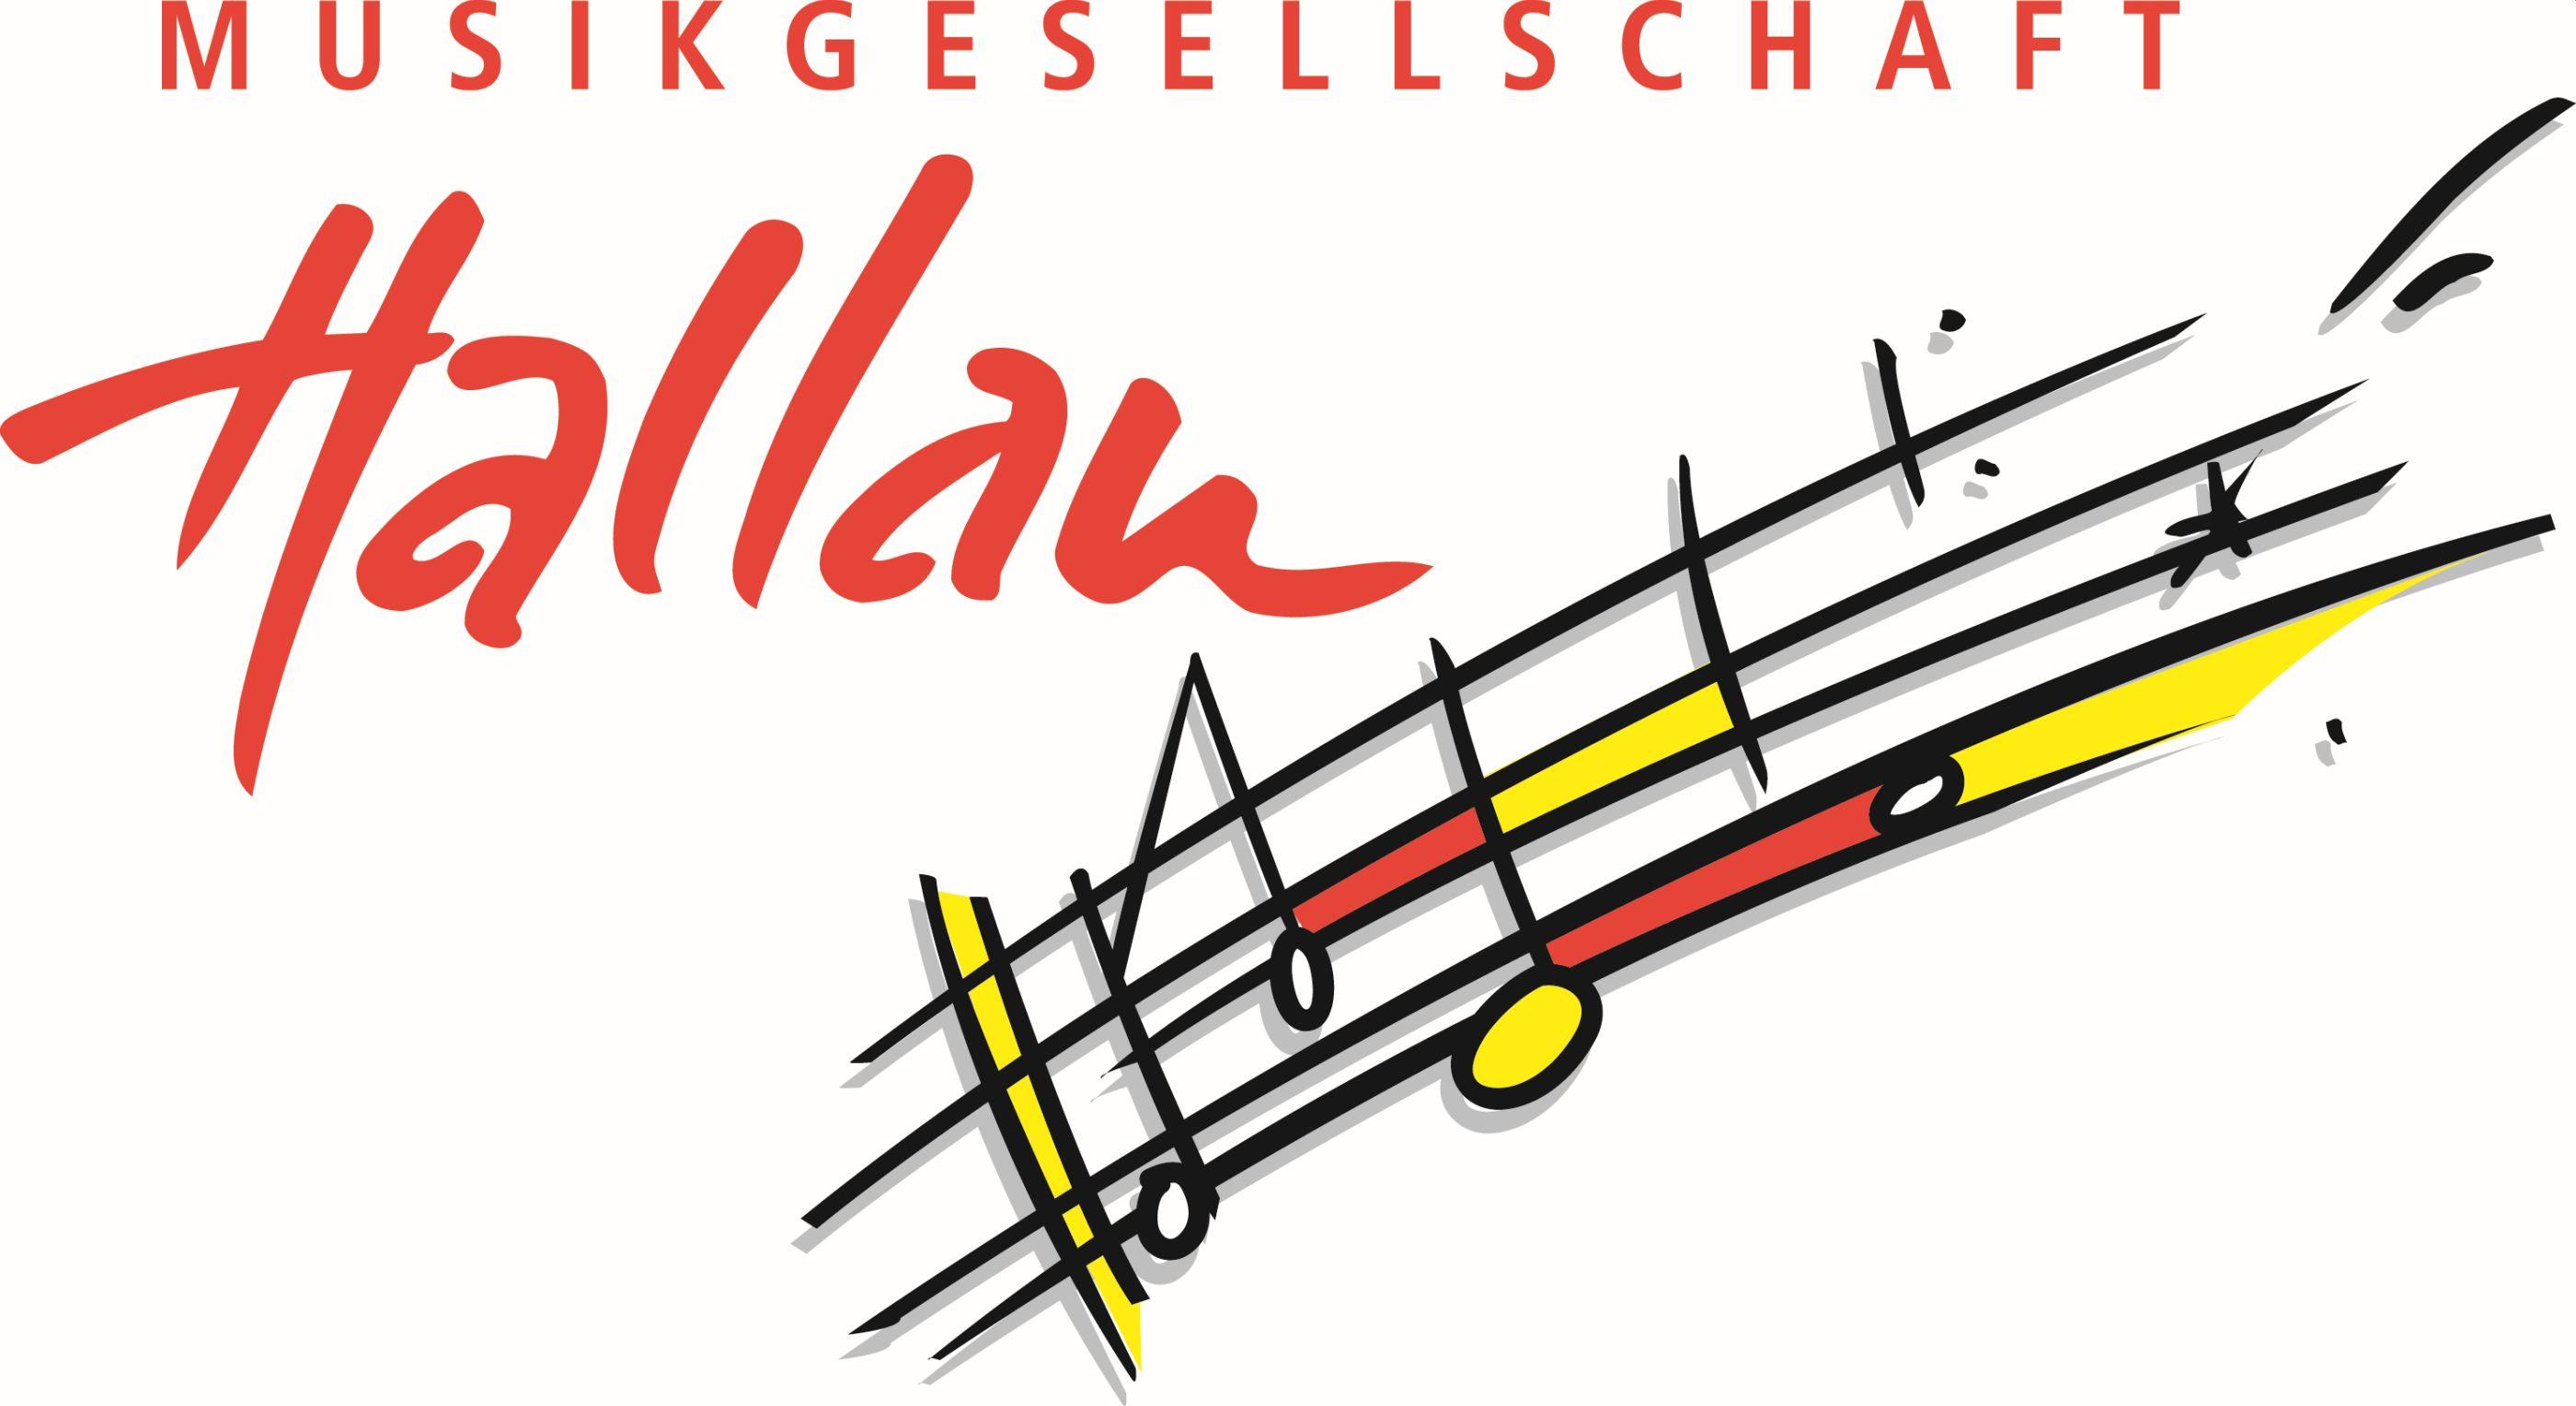 Musikgesellschaft Hallau